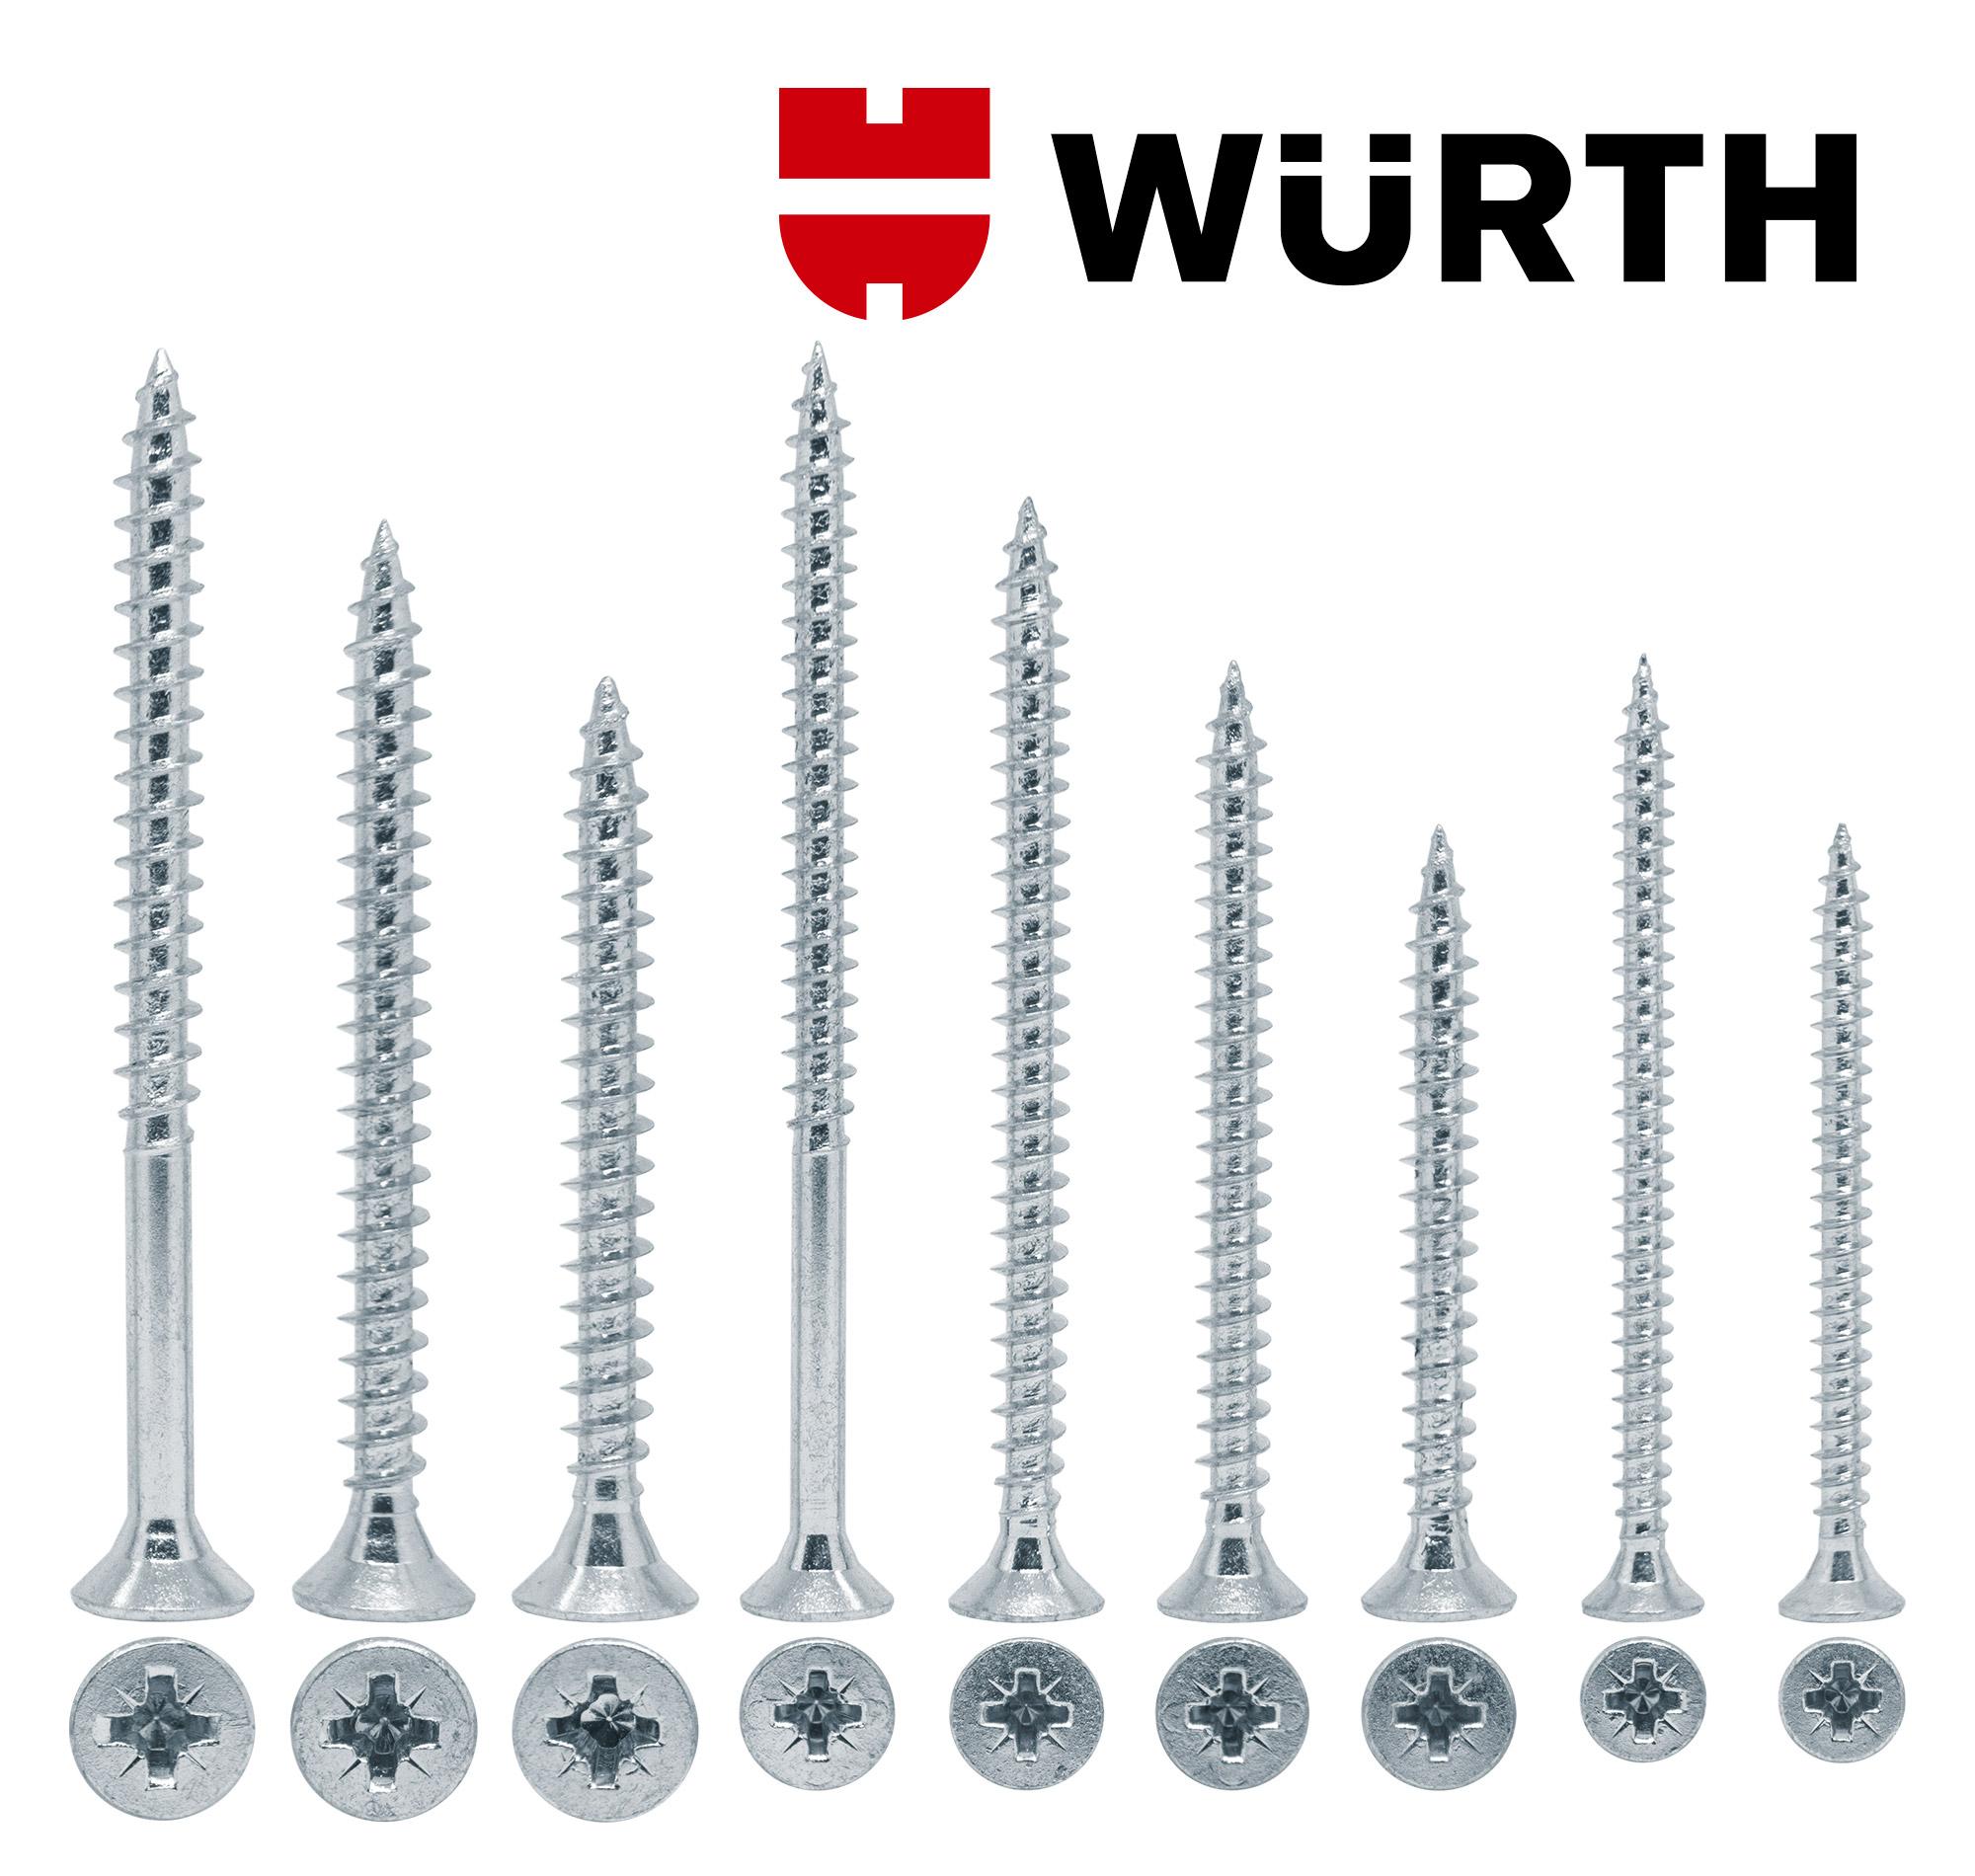 Würth šrafovi za spojnice T prečke i čepove lažne prečke